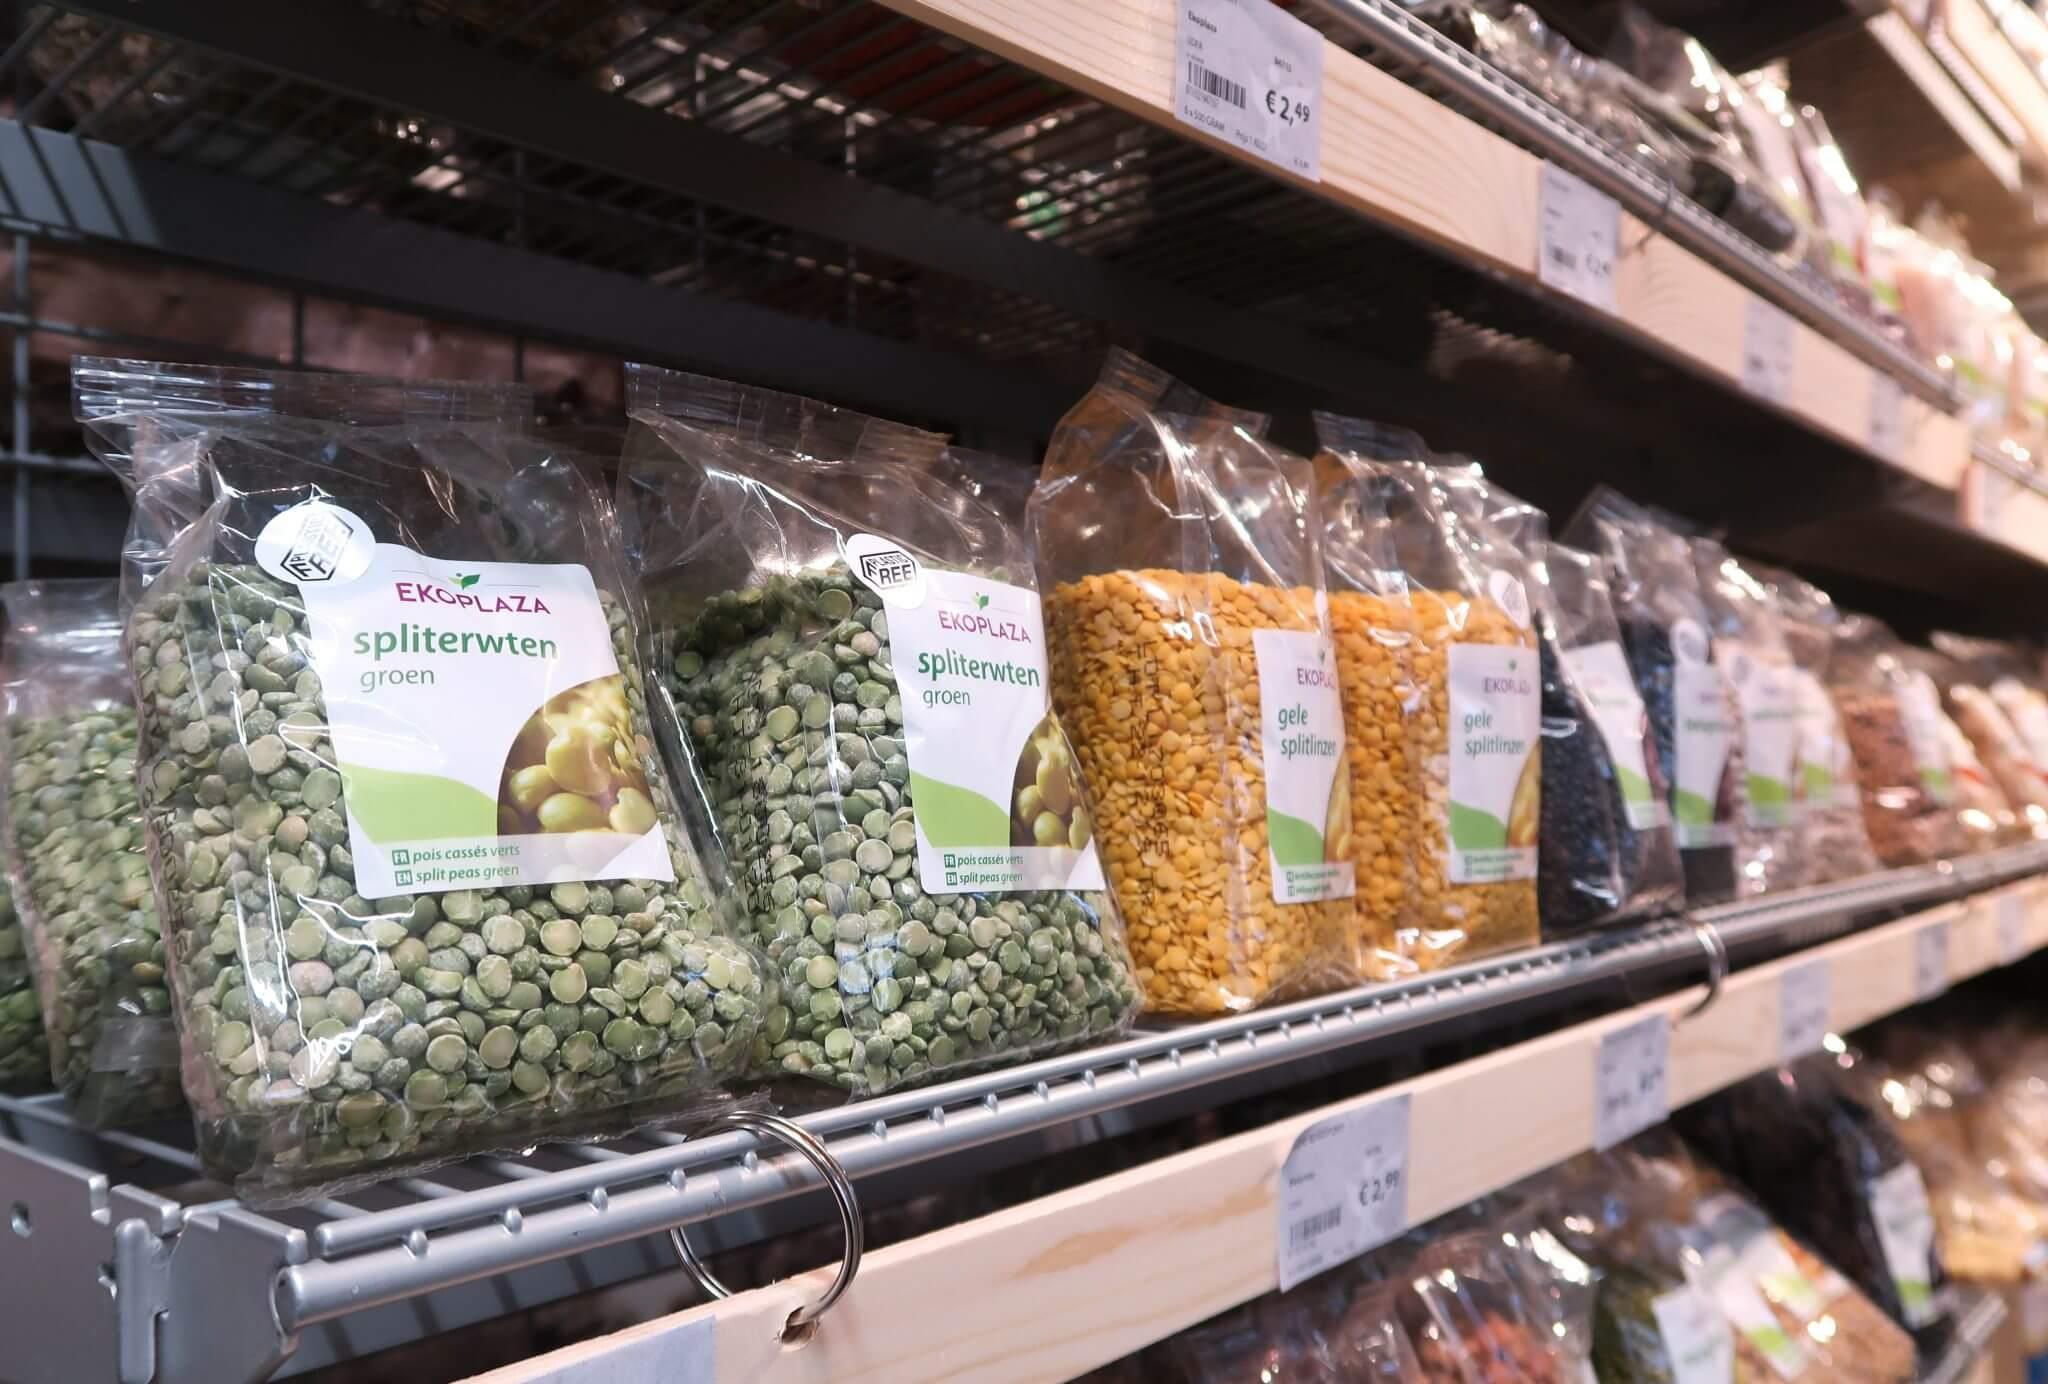 ekoplaza-plasticvrije-supermarkt2 (1 van 1)